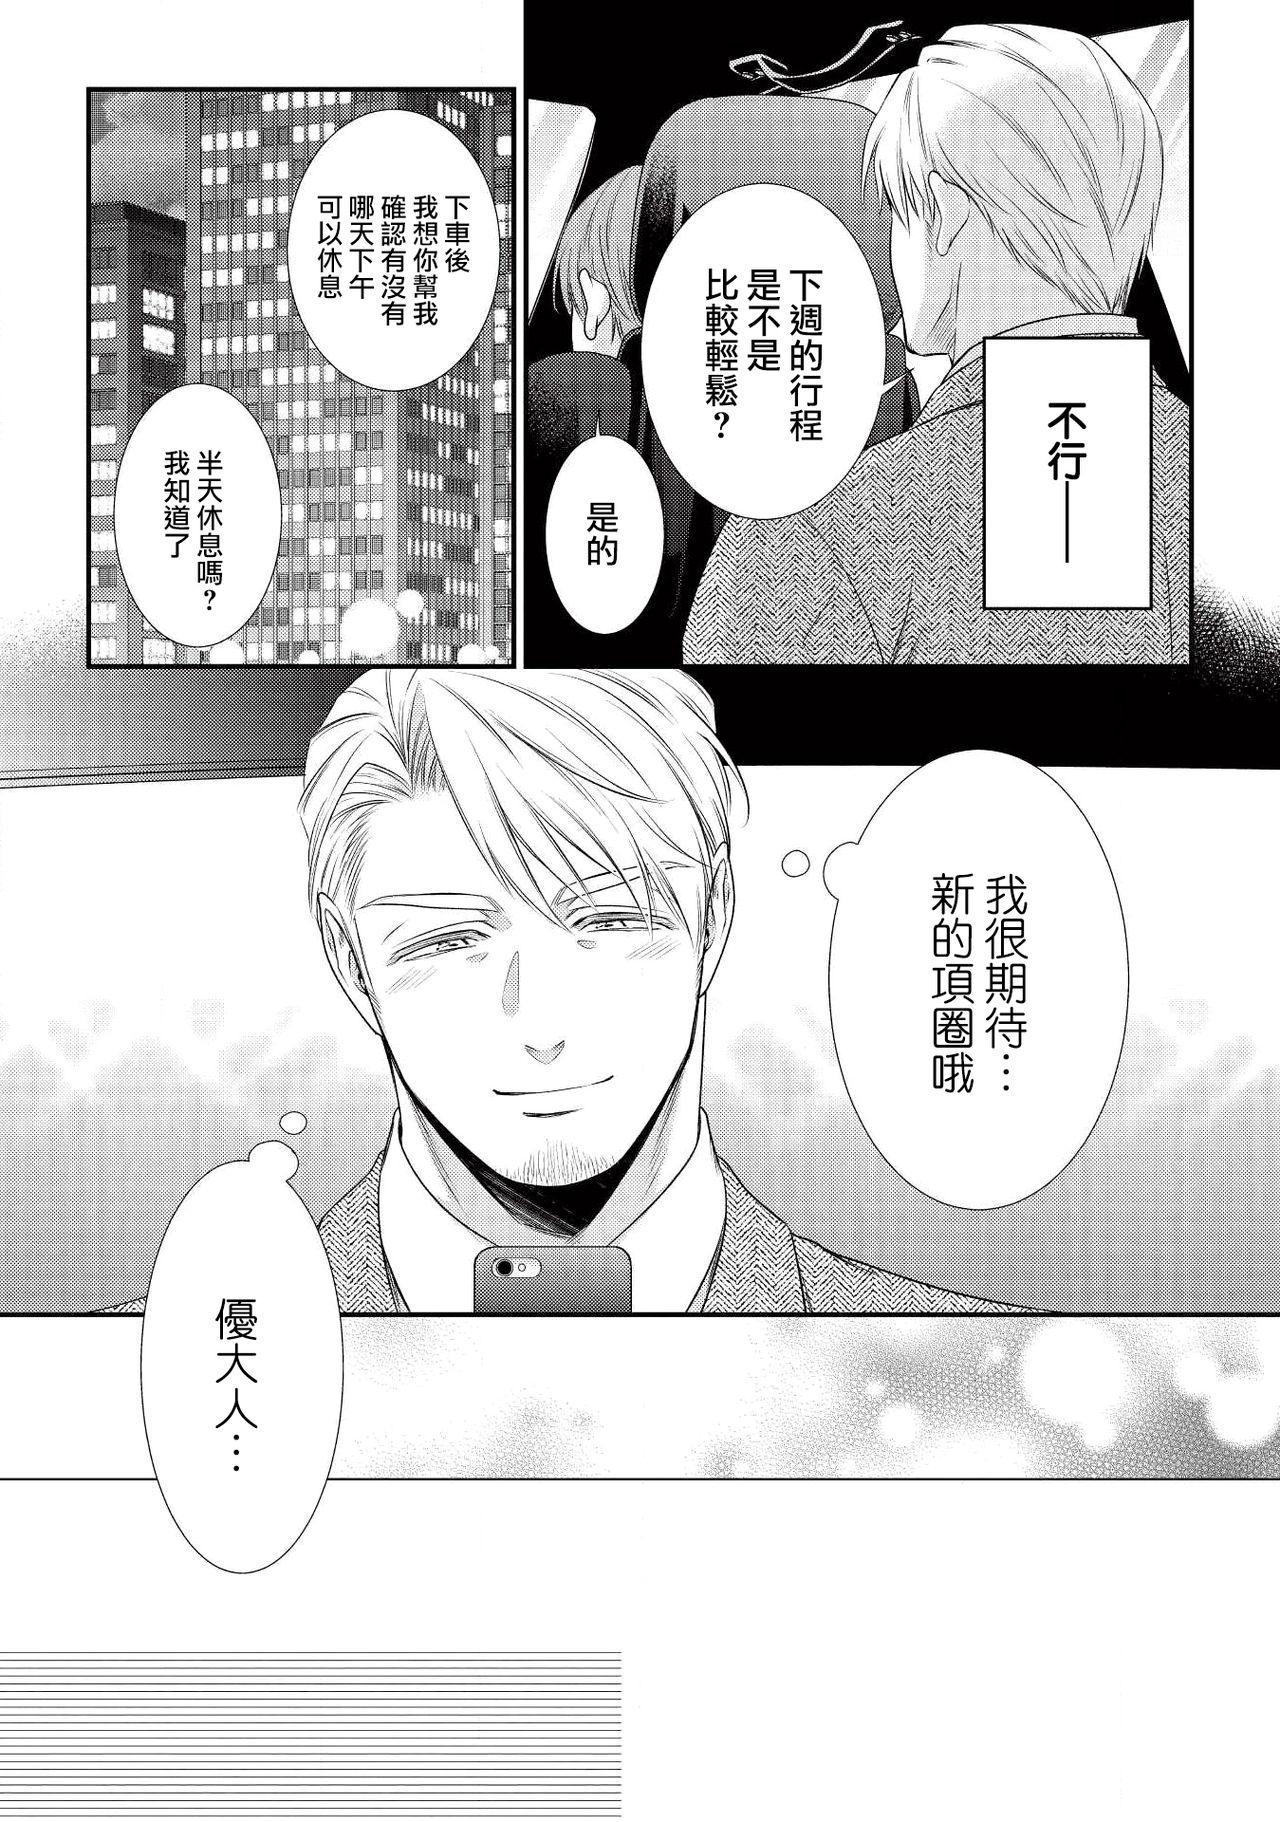 [Aion Kiu] Ijimete Kudasai Omega-sama ch.1-2 [Chinese] [沒有漢化] [Digital] 43